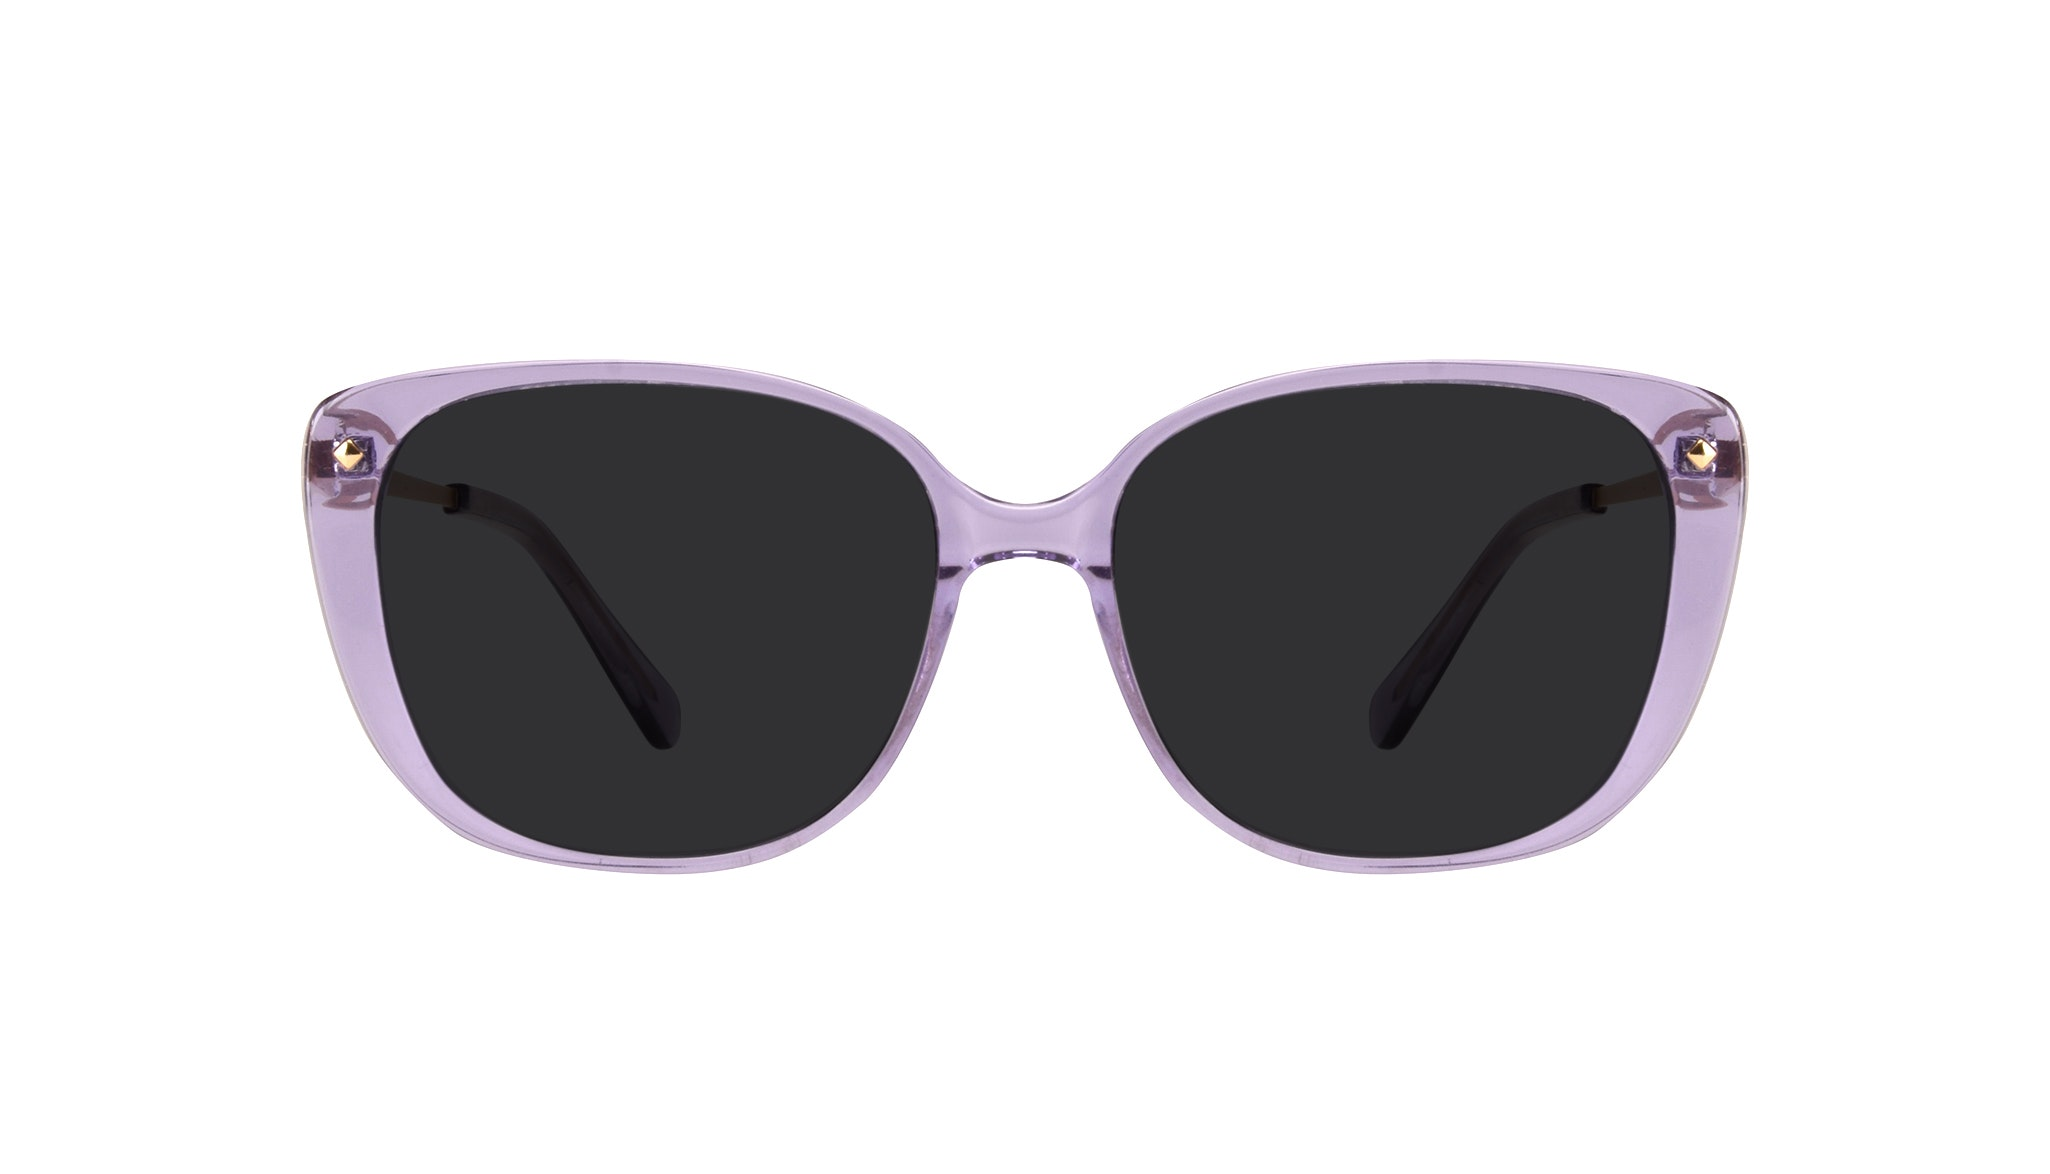 Affordable Fashion Glasses Square Sunglasses Women Japonisme Lavender